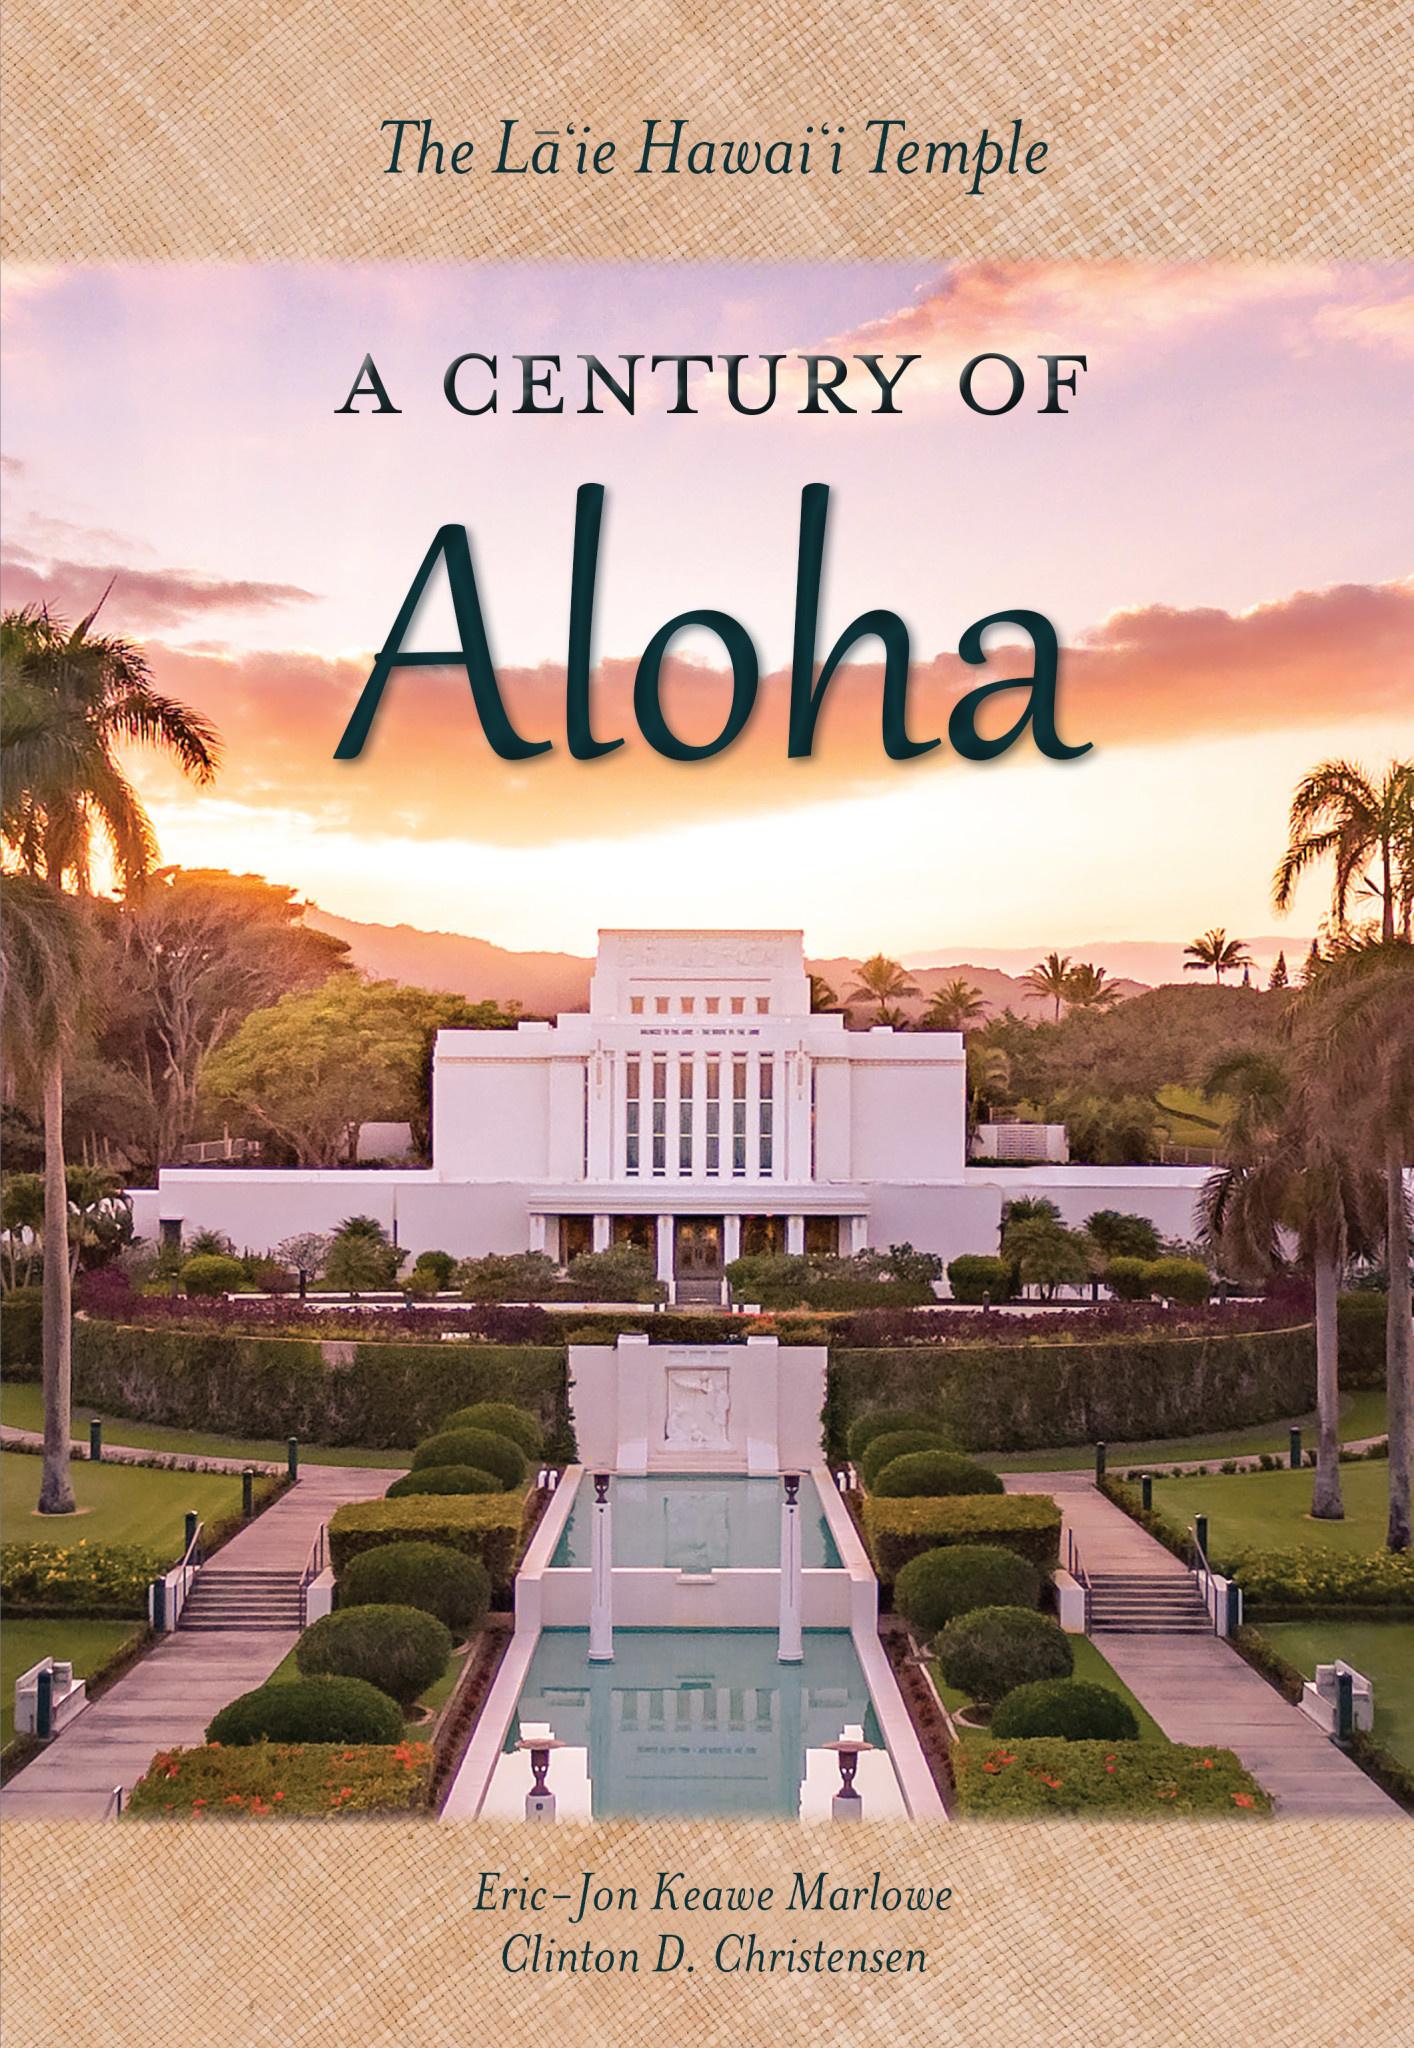 NEW RELEASE: The Laie Hawaii Temple-A Century of Aloha - Marlowe